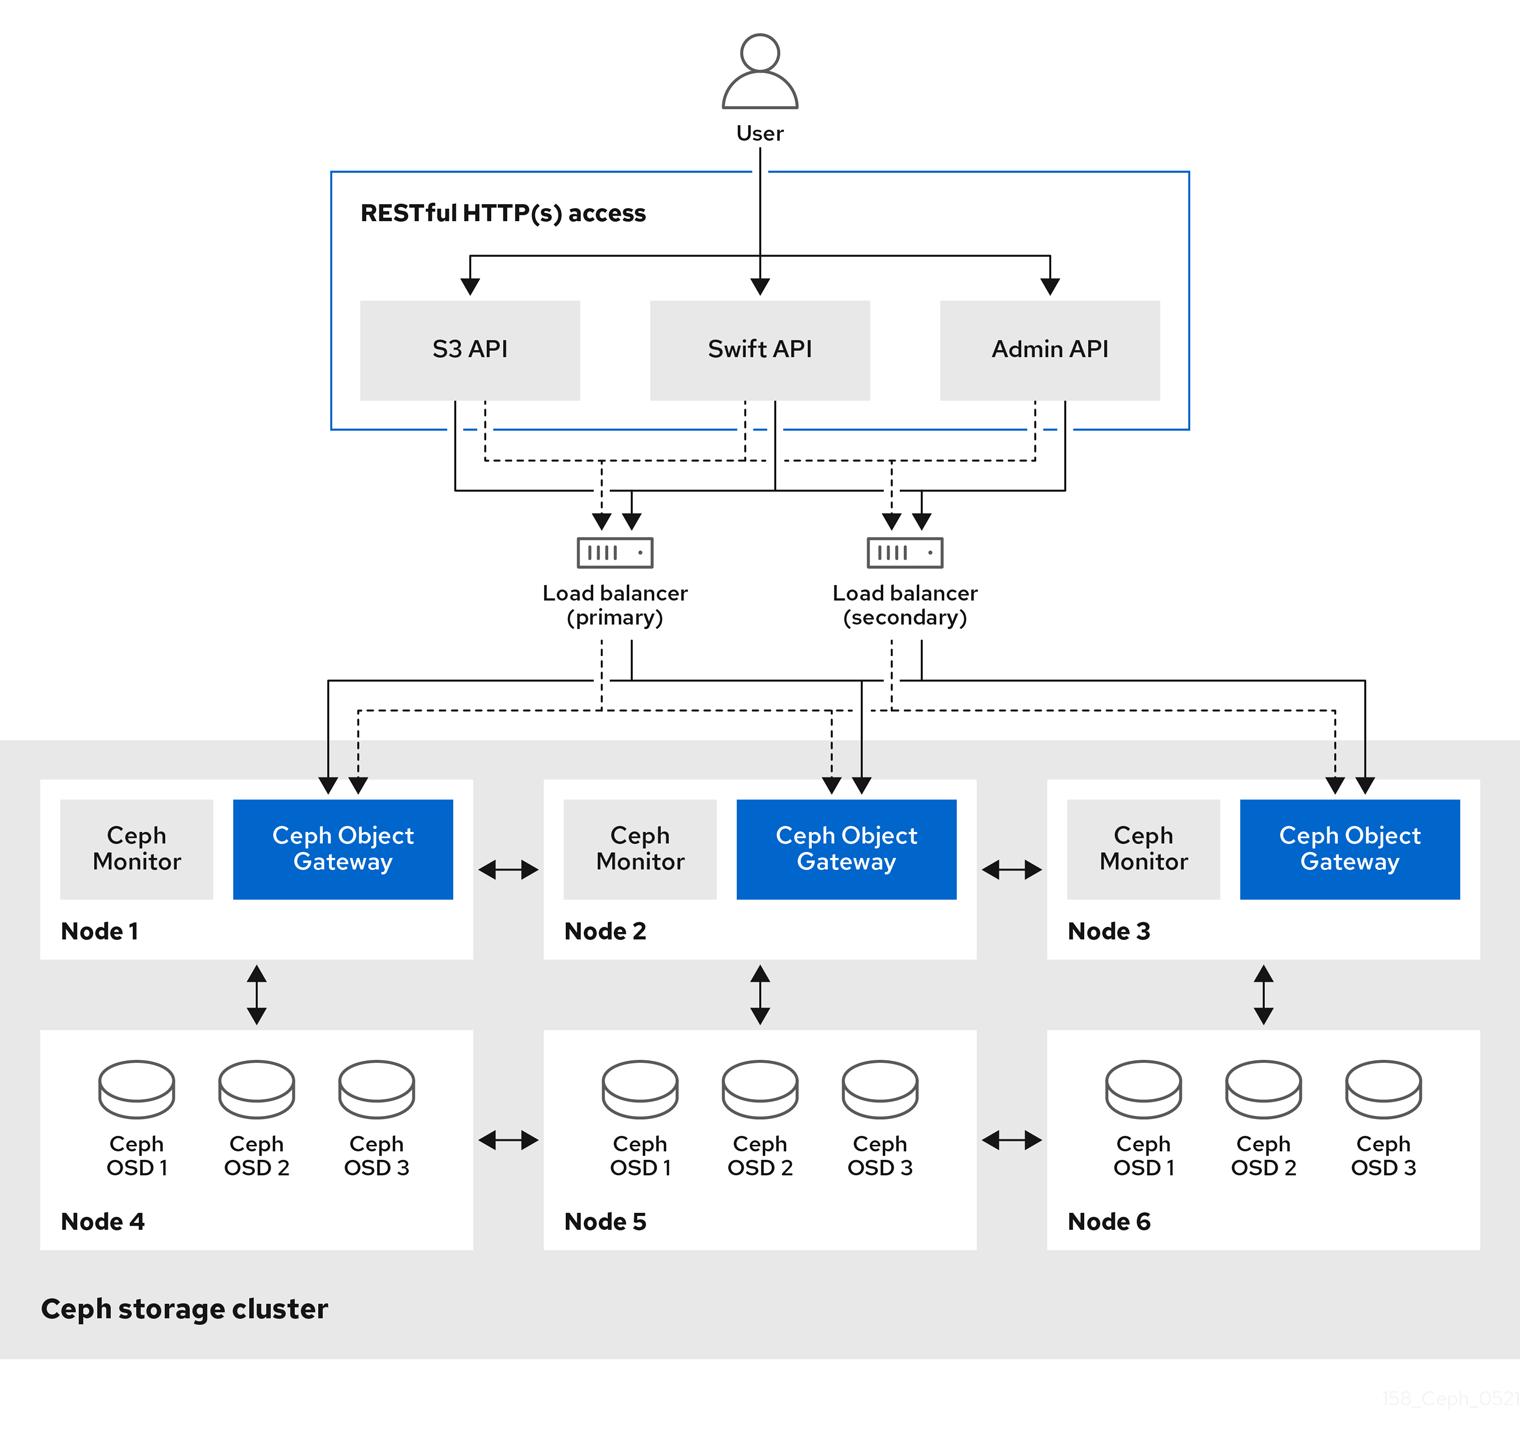 Basic Access Diagram